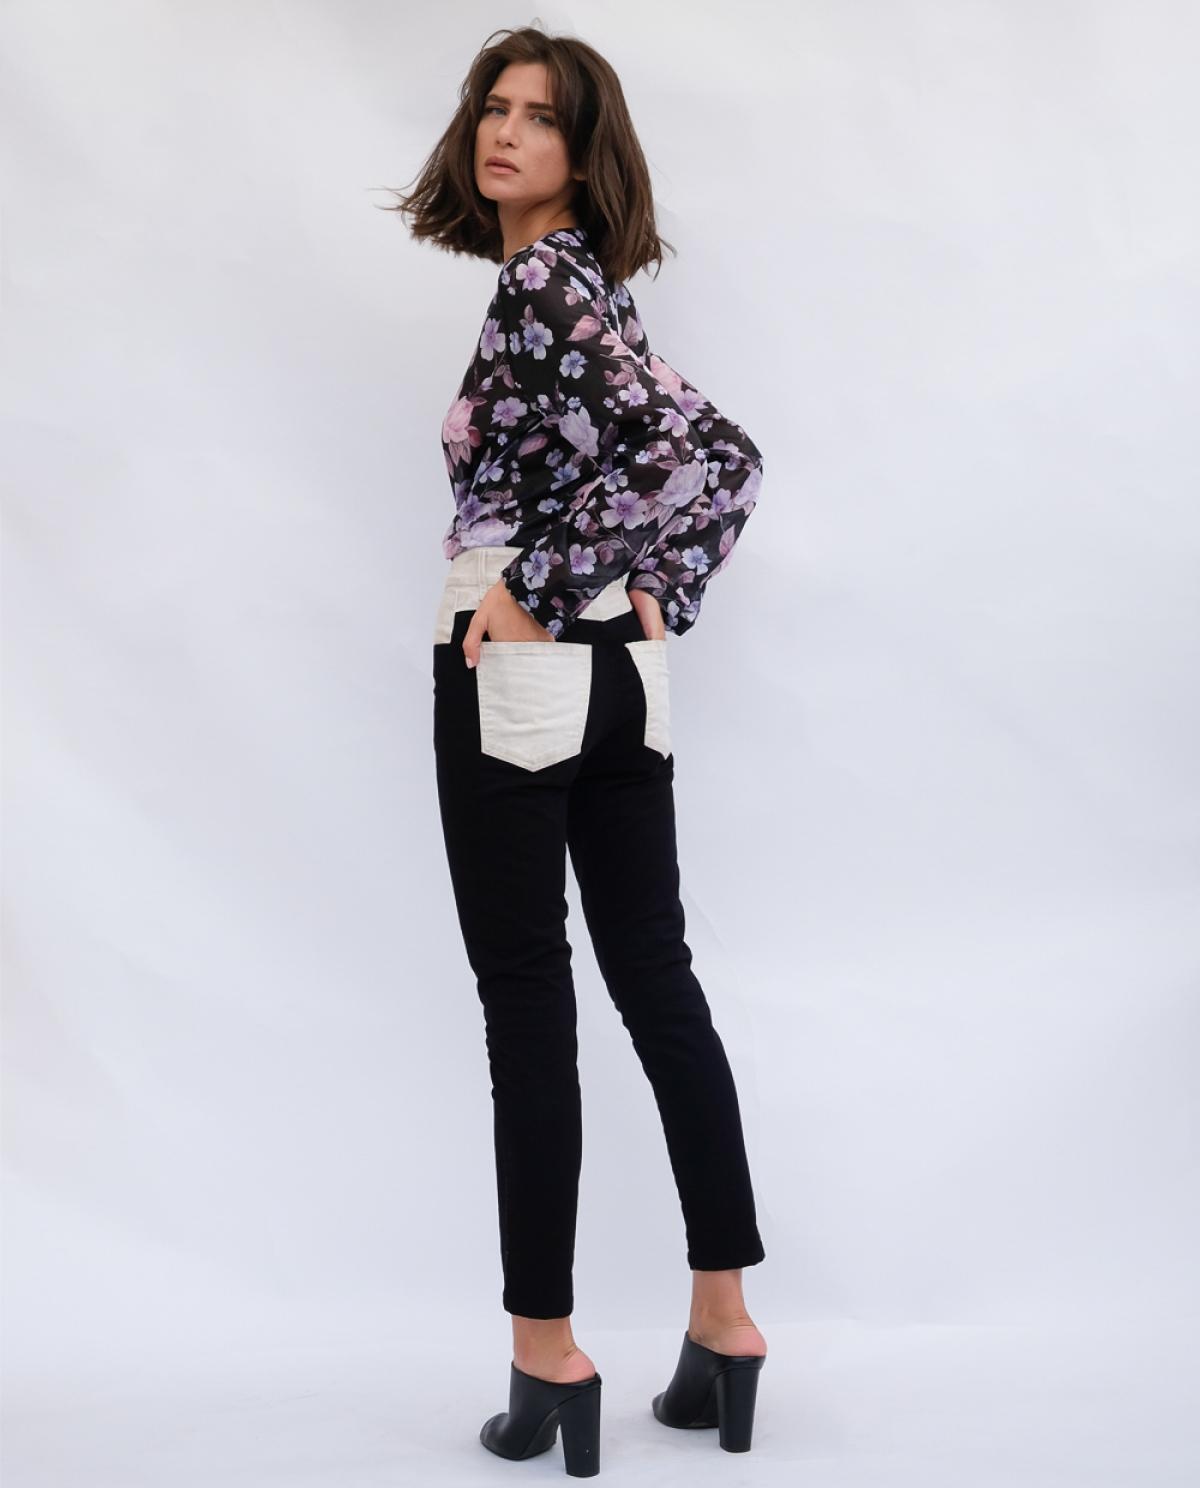 Melina Black and White Skinny Jeans